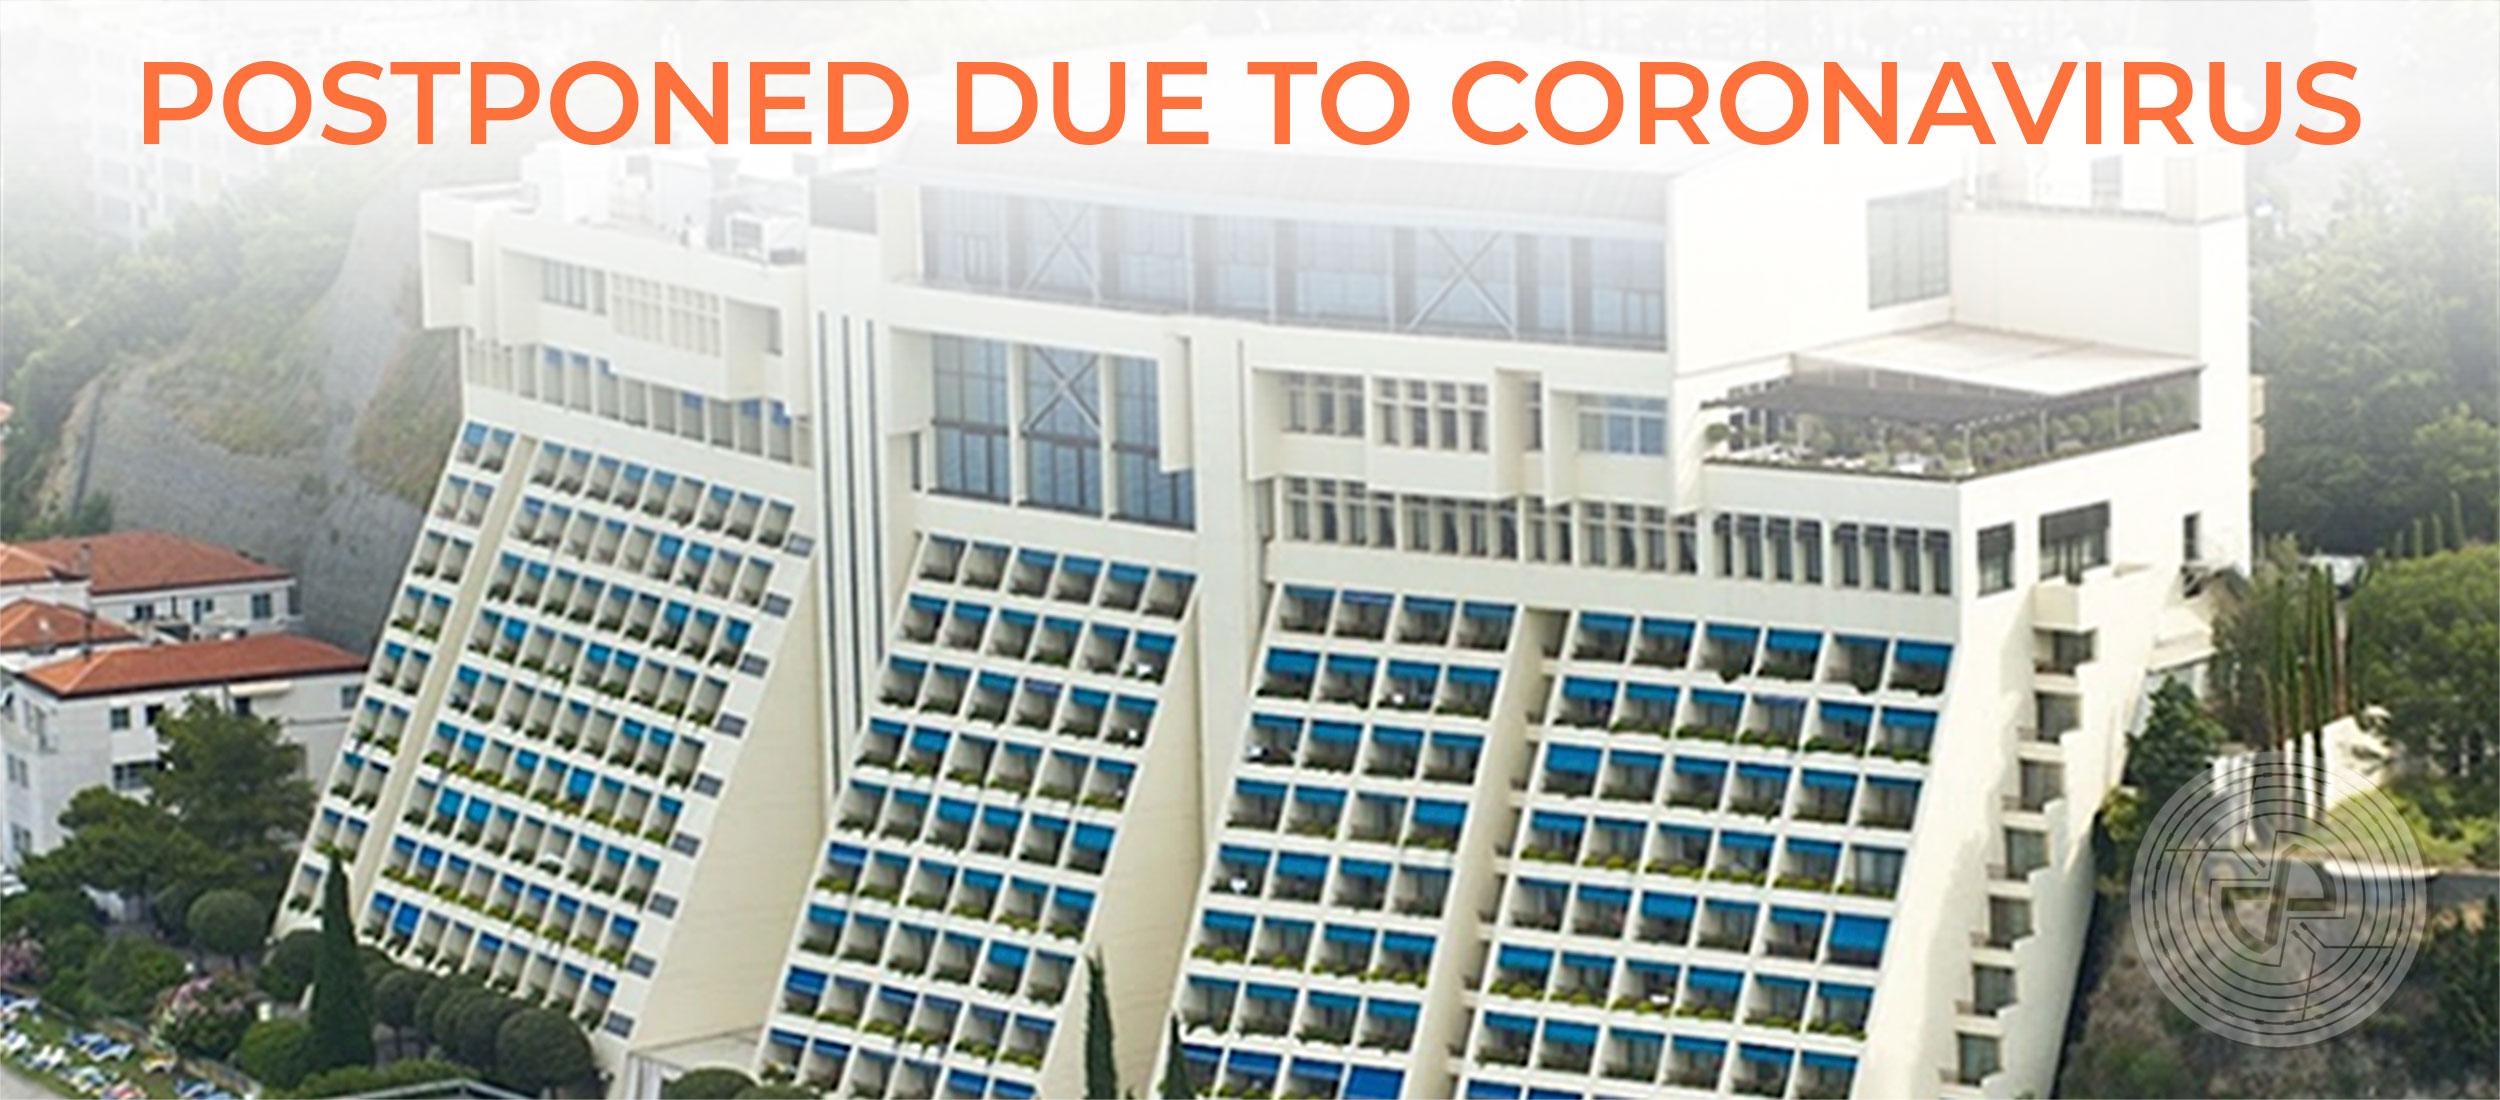 SZE 2020 International Conference: POSTPONED DUE TO CORONAVIRUS